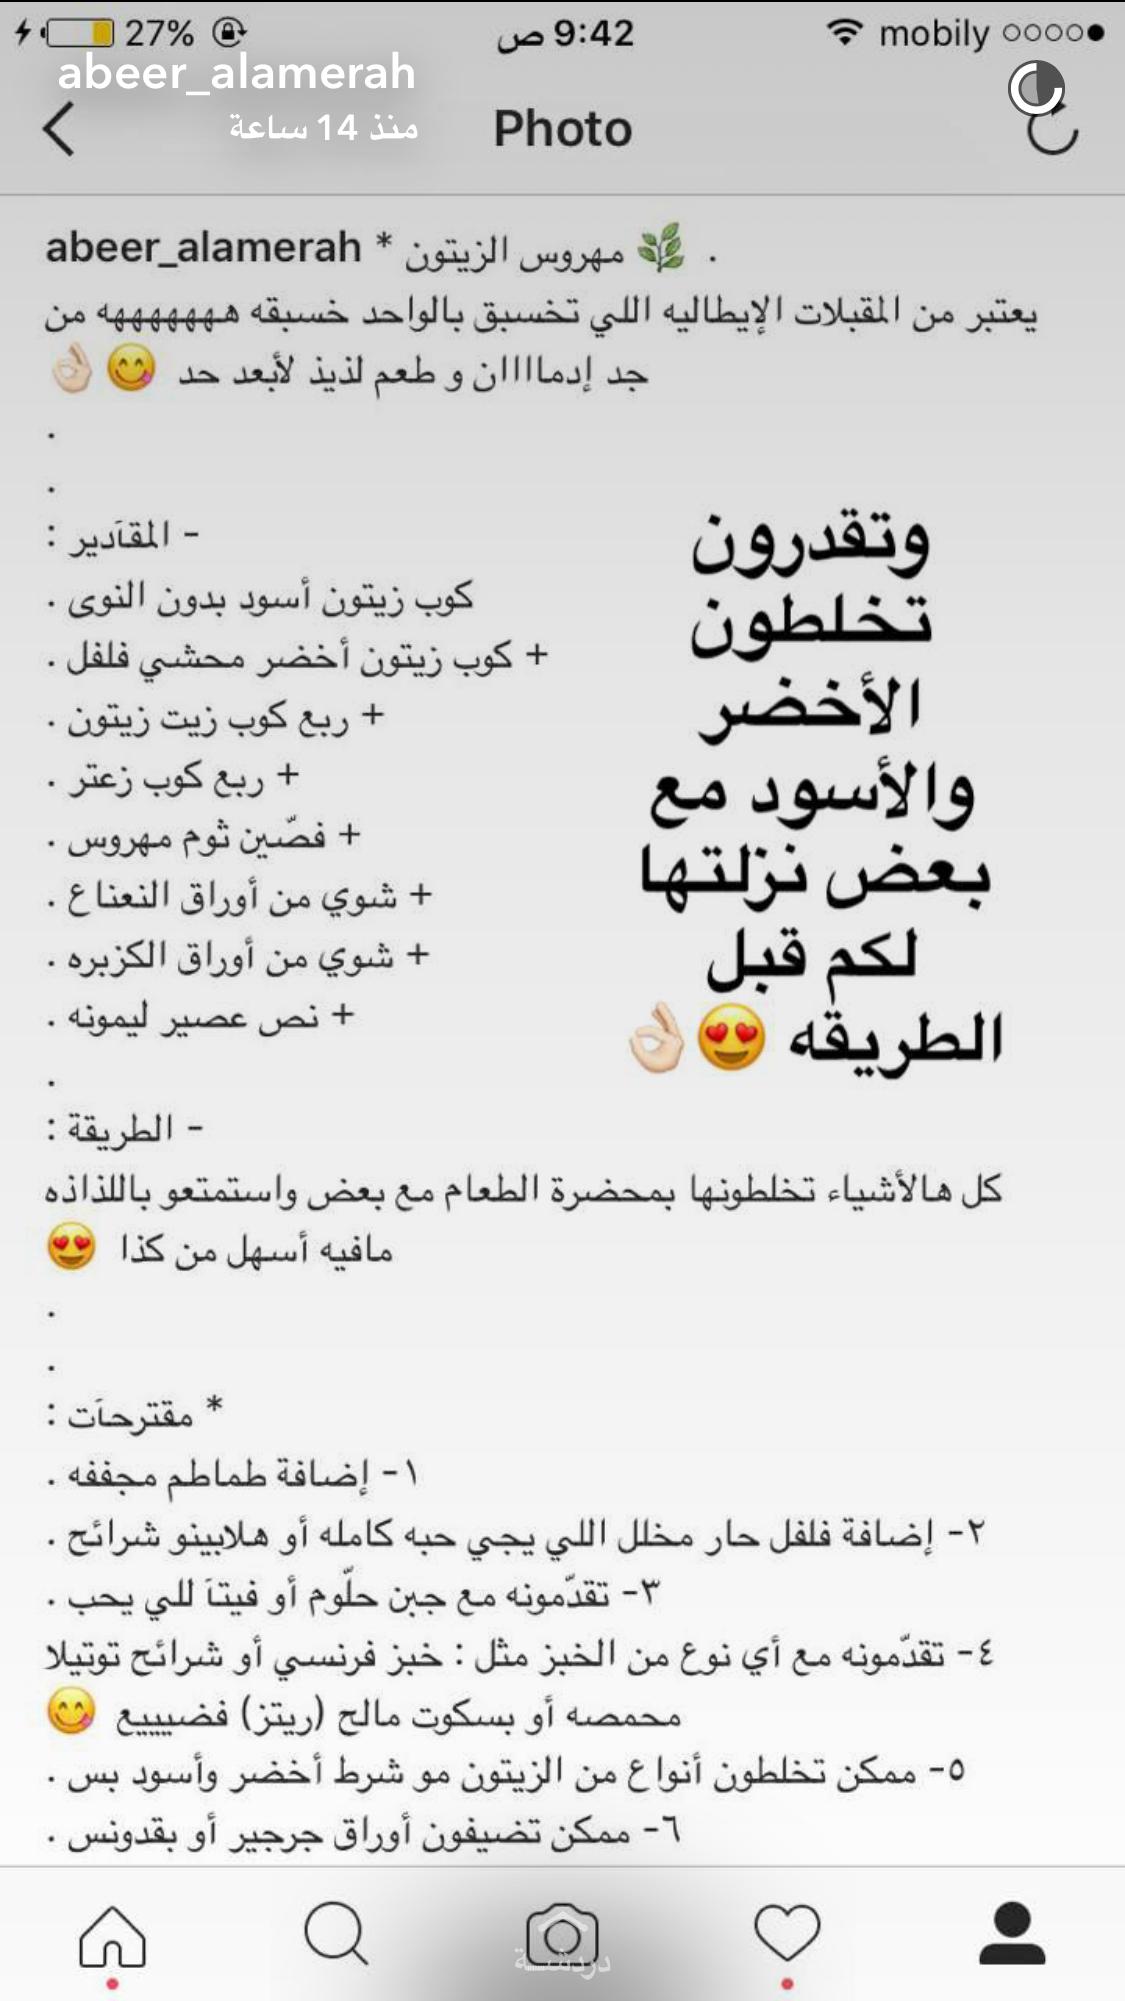 مهروس الزيتون Arabic Food Food And Drink Recipes